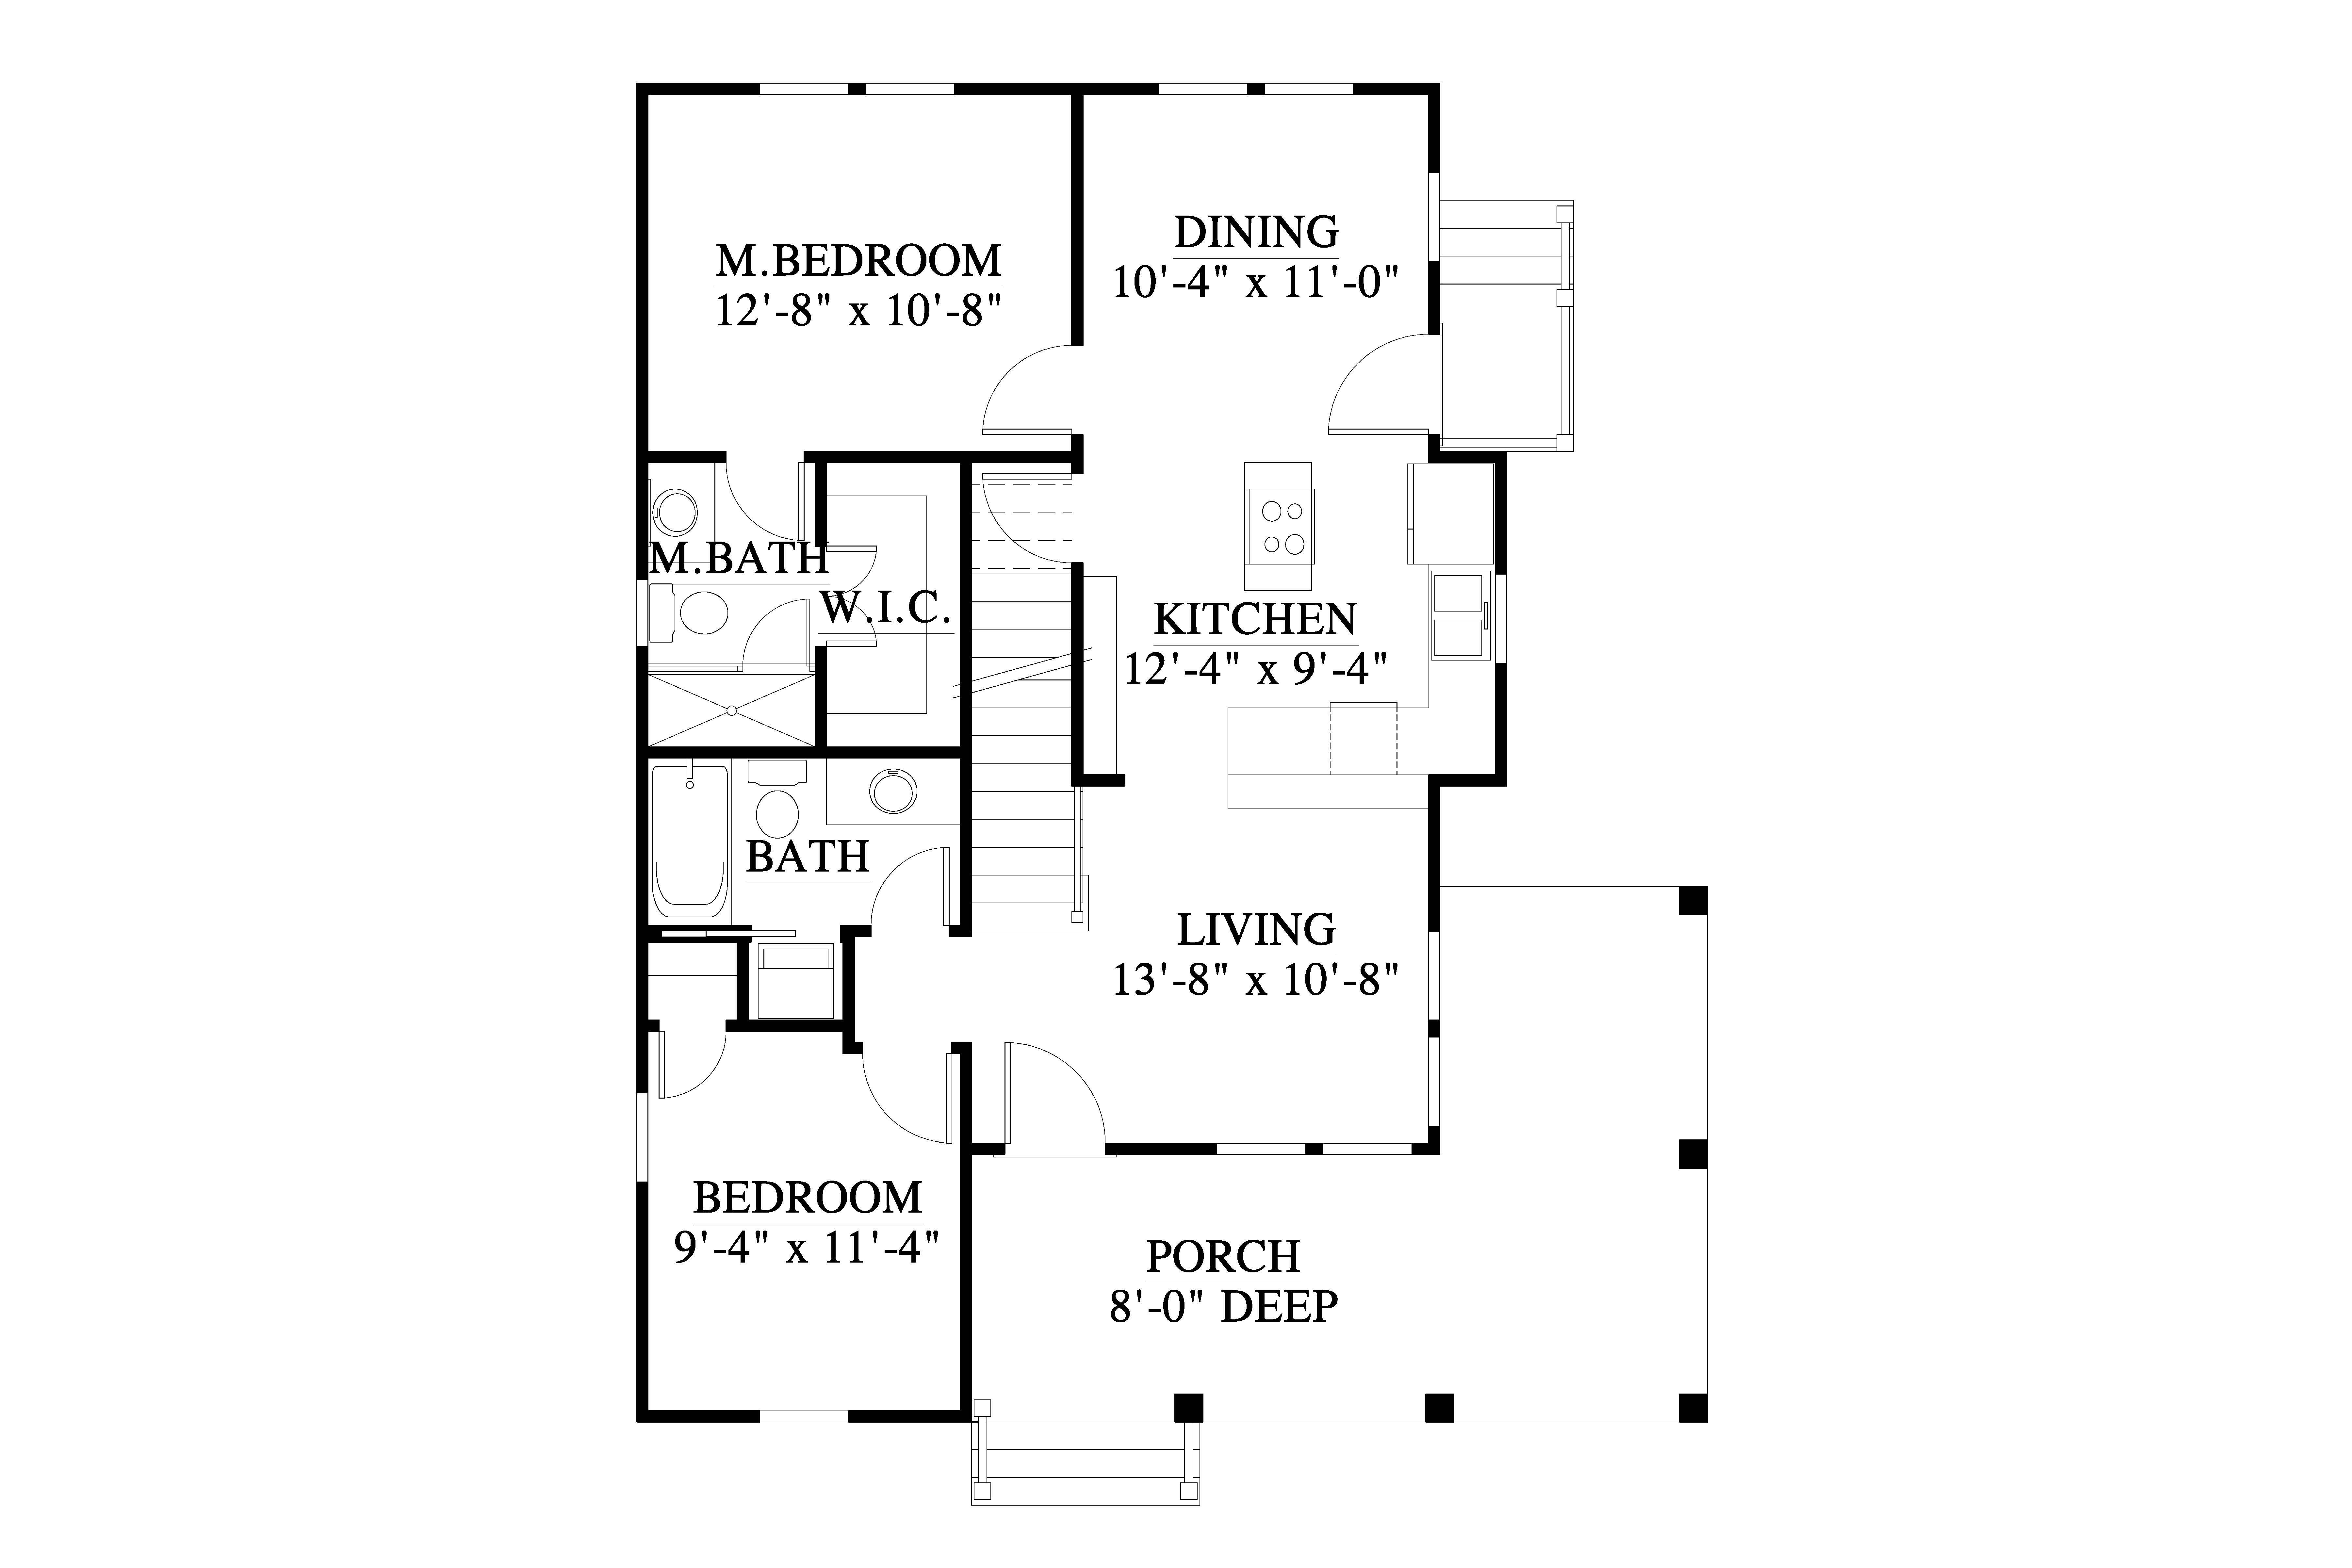 Drawn robin bath (K20020) The Allison Robin House